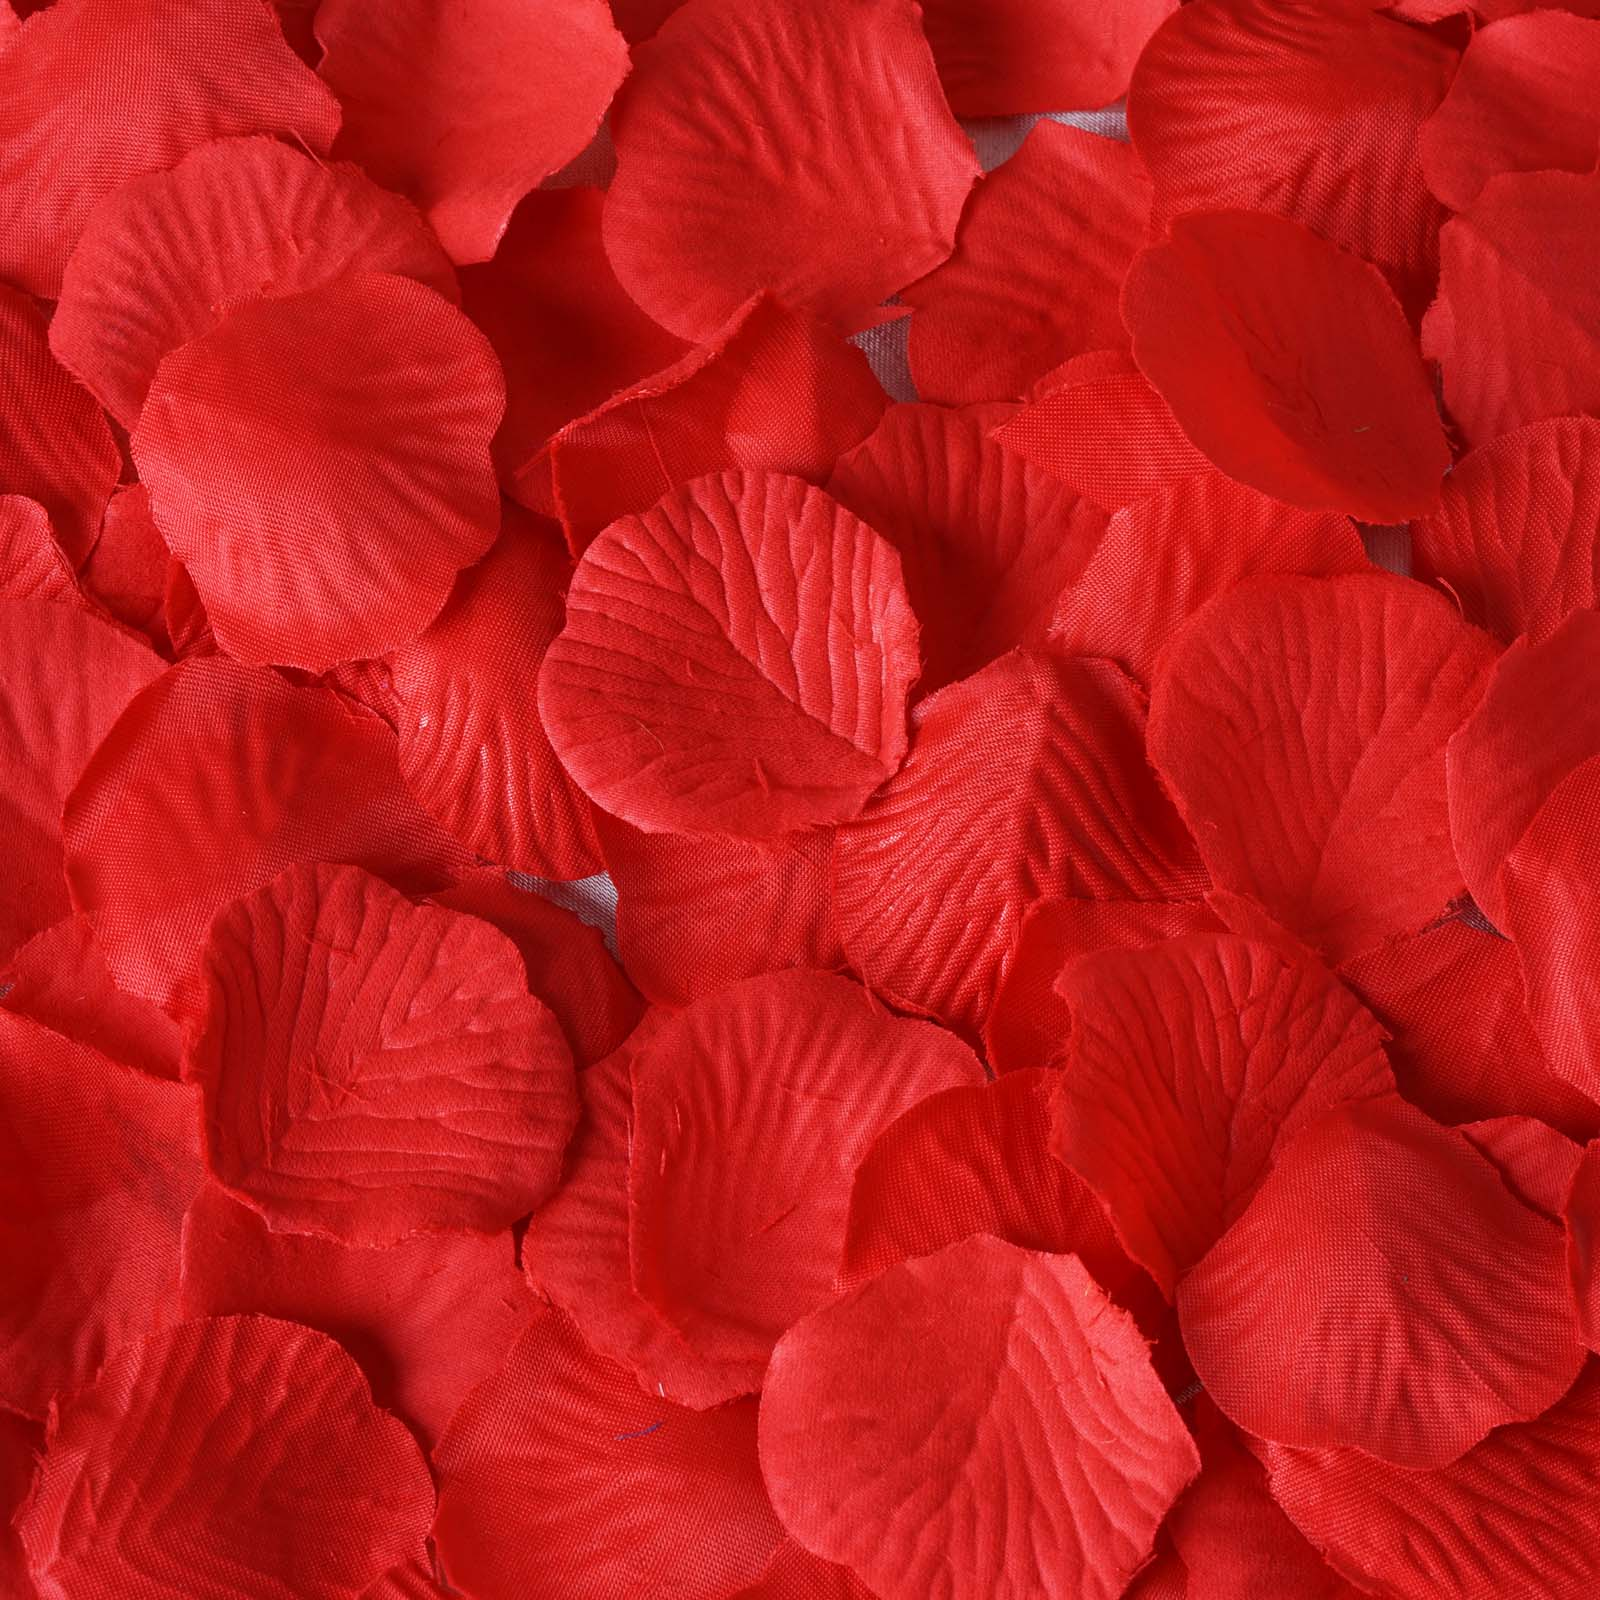 4000 silk rose petals wedding decorations favors wholesale bulk supplies sale ebay. Black Bedroom Furniture Sets. Home Design Ideas